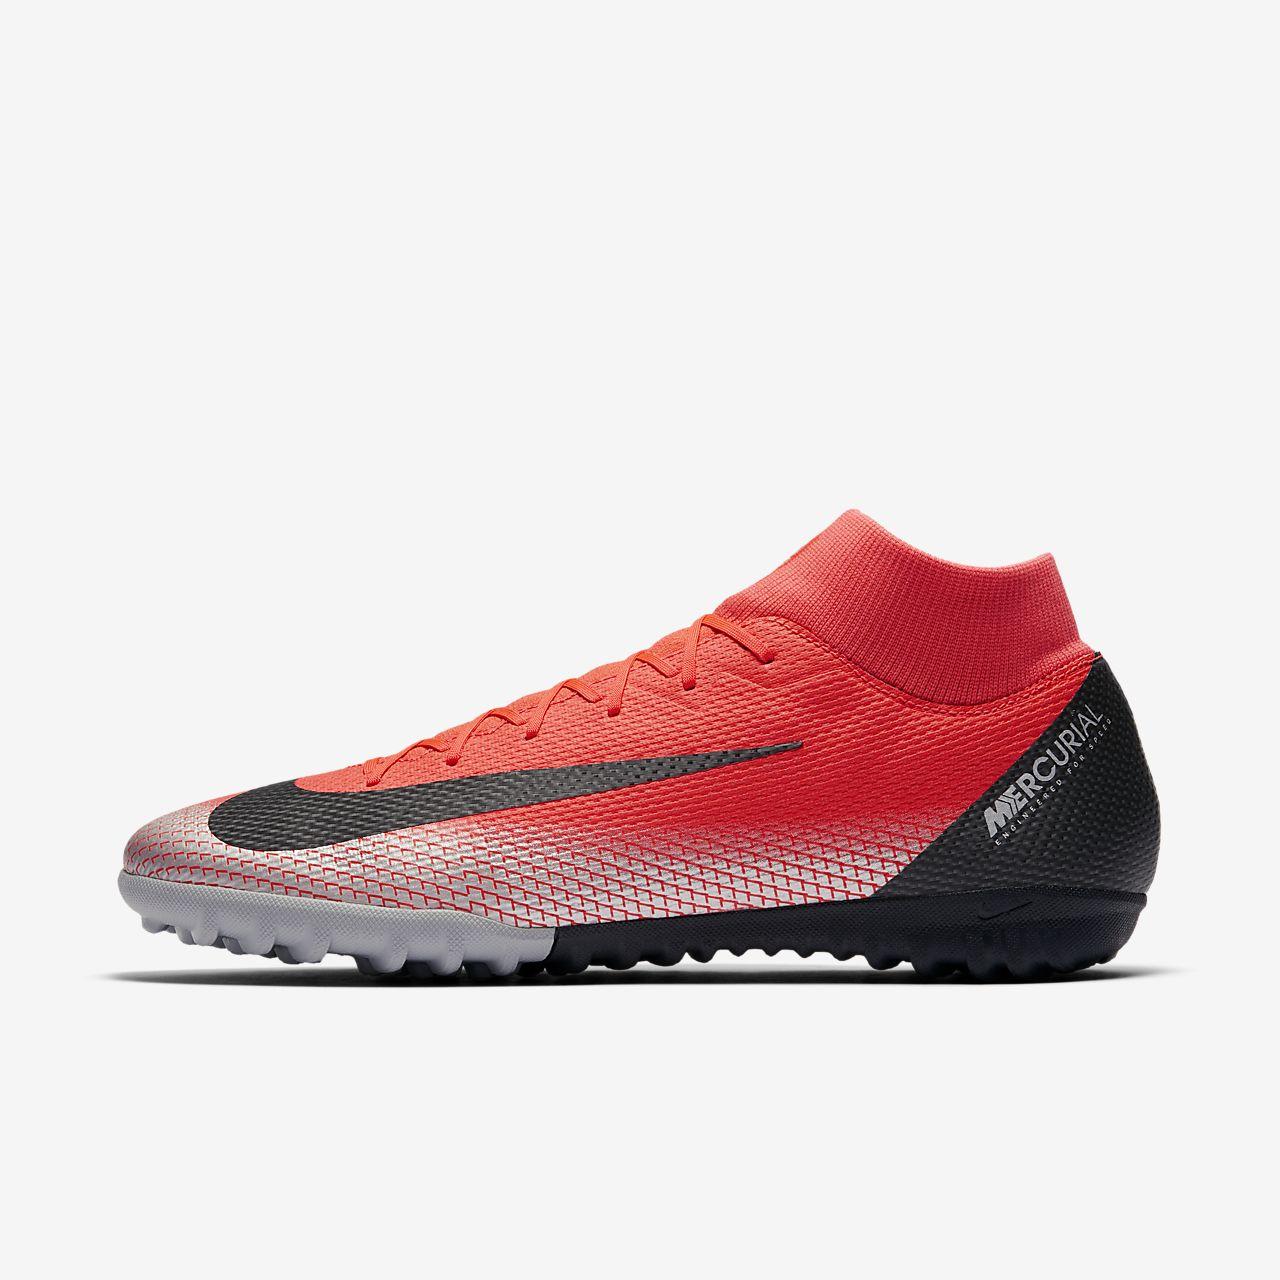 san francisco 44d99 ca8f0 ... Calzado de fútbol para pasto artificial Nike SuperflyX 6 Academy TF